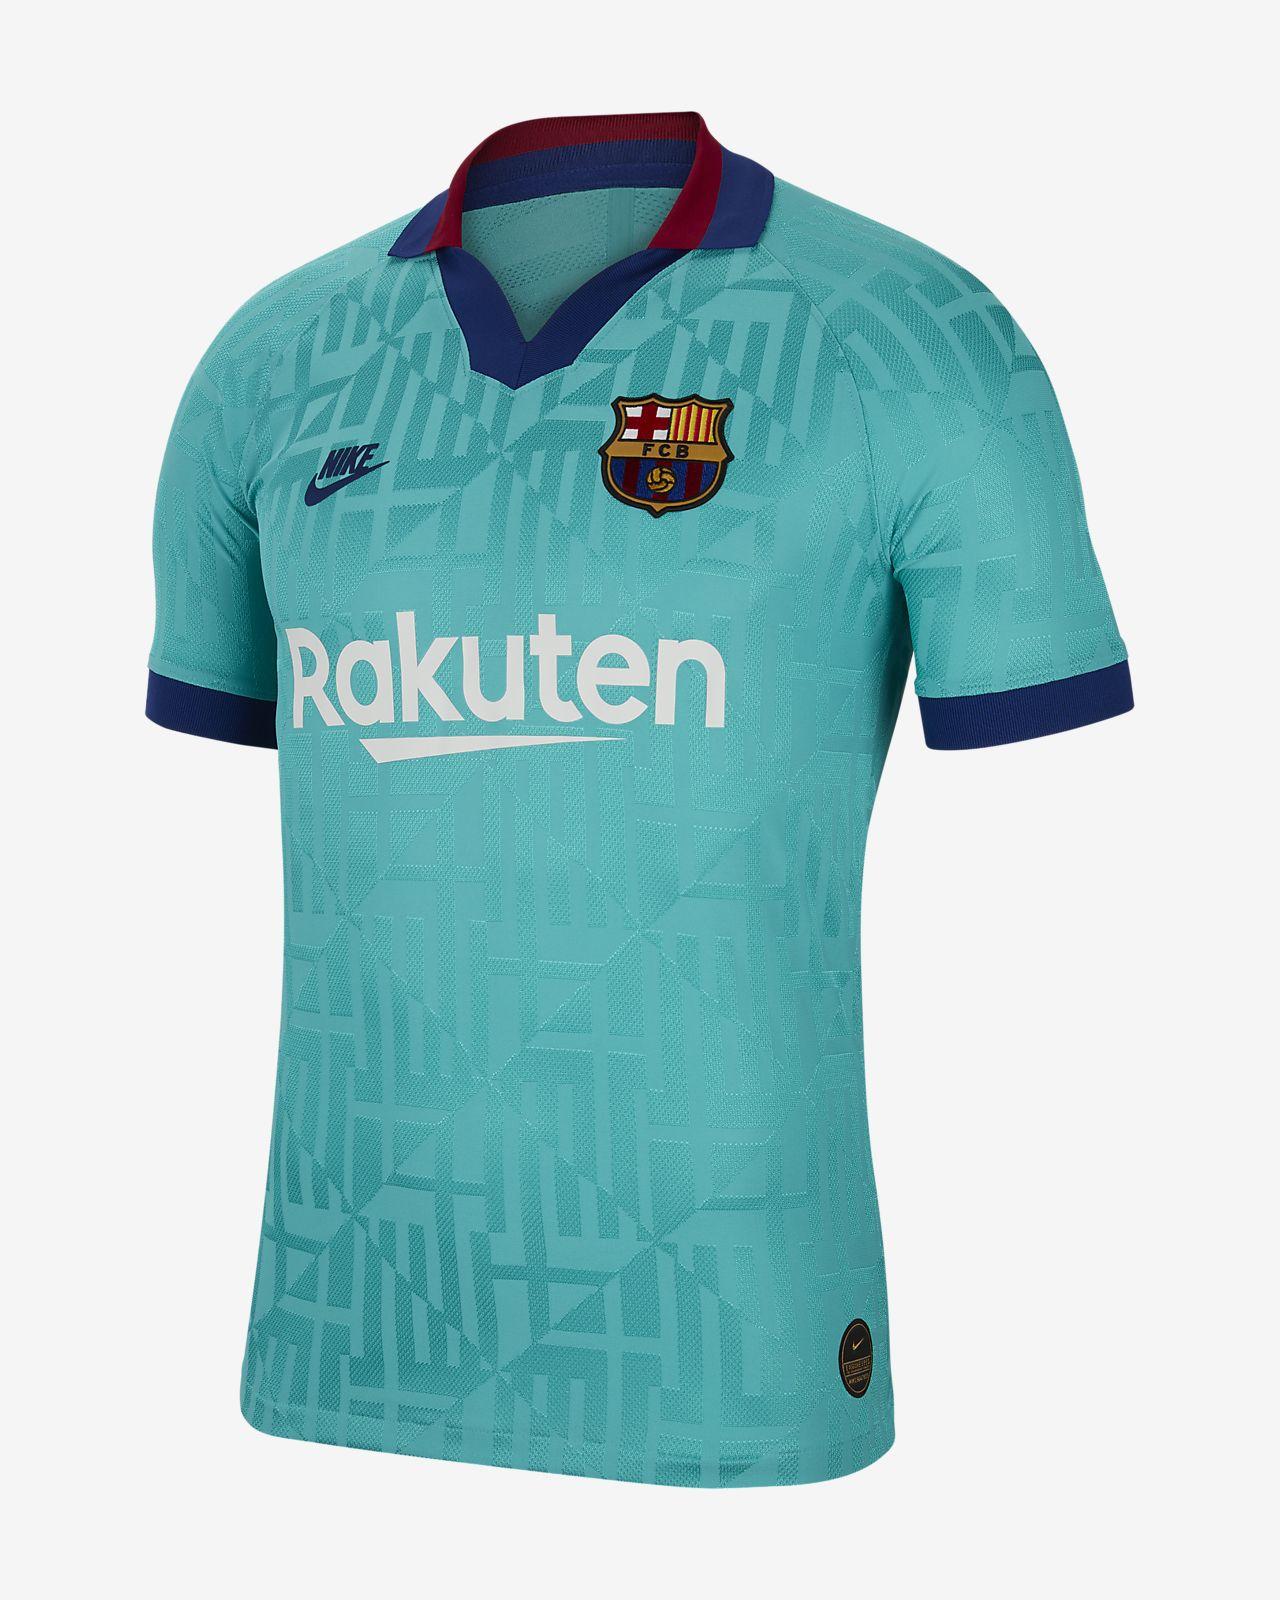 Camiseta alternativa de fútbol para hombre Vapor Match 2019/20 del FC Barcelona